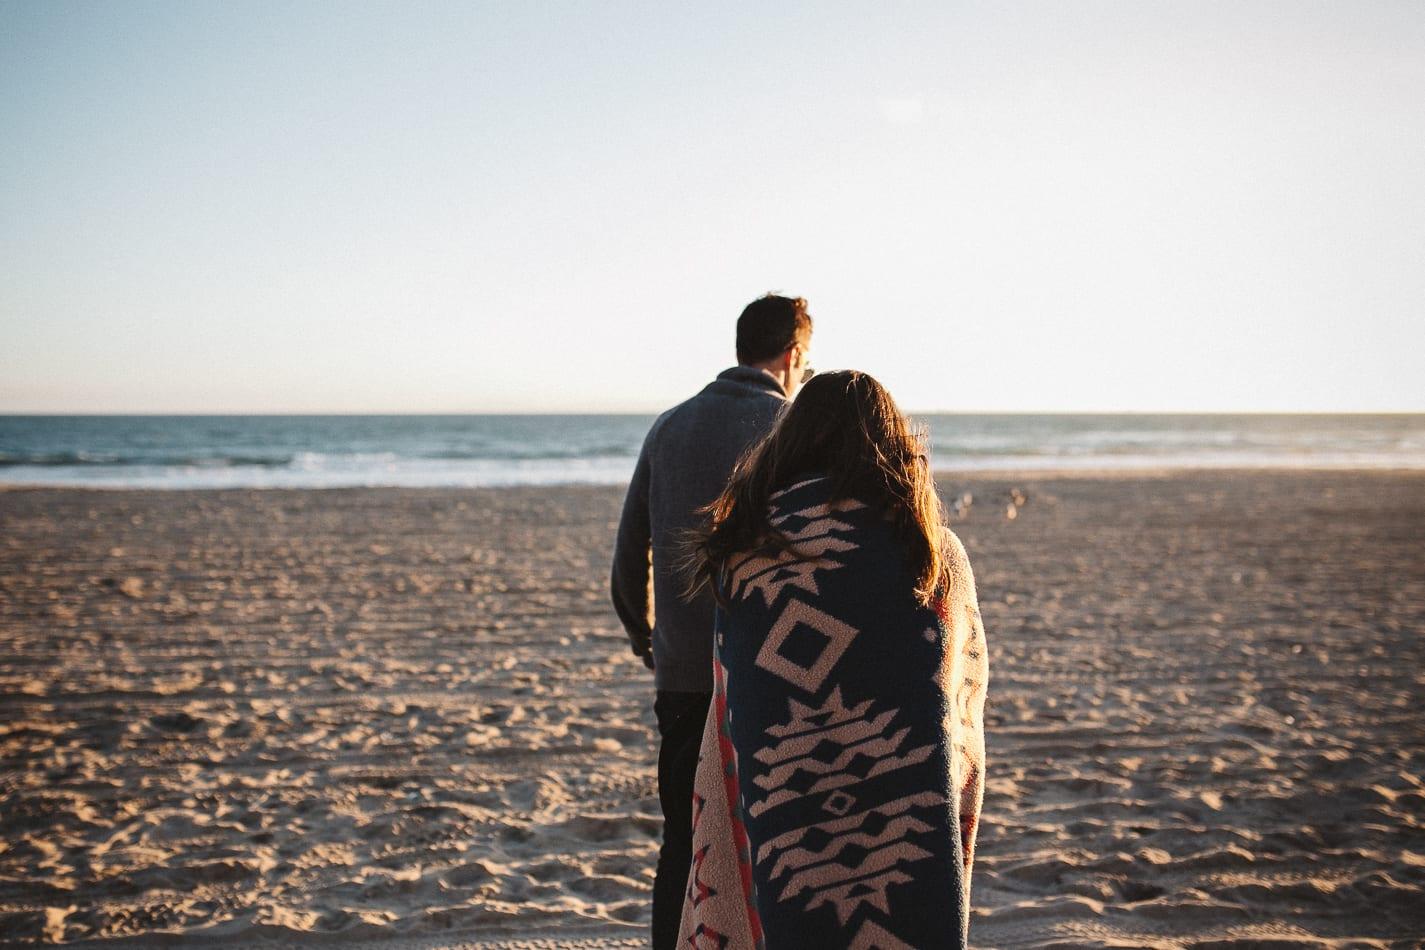 jason-alyssa-huntington-beach-california-engagement-photographer-1